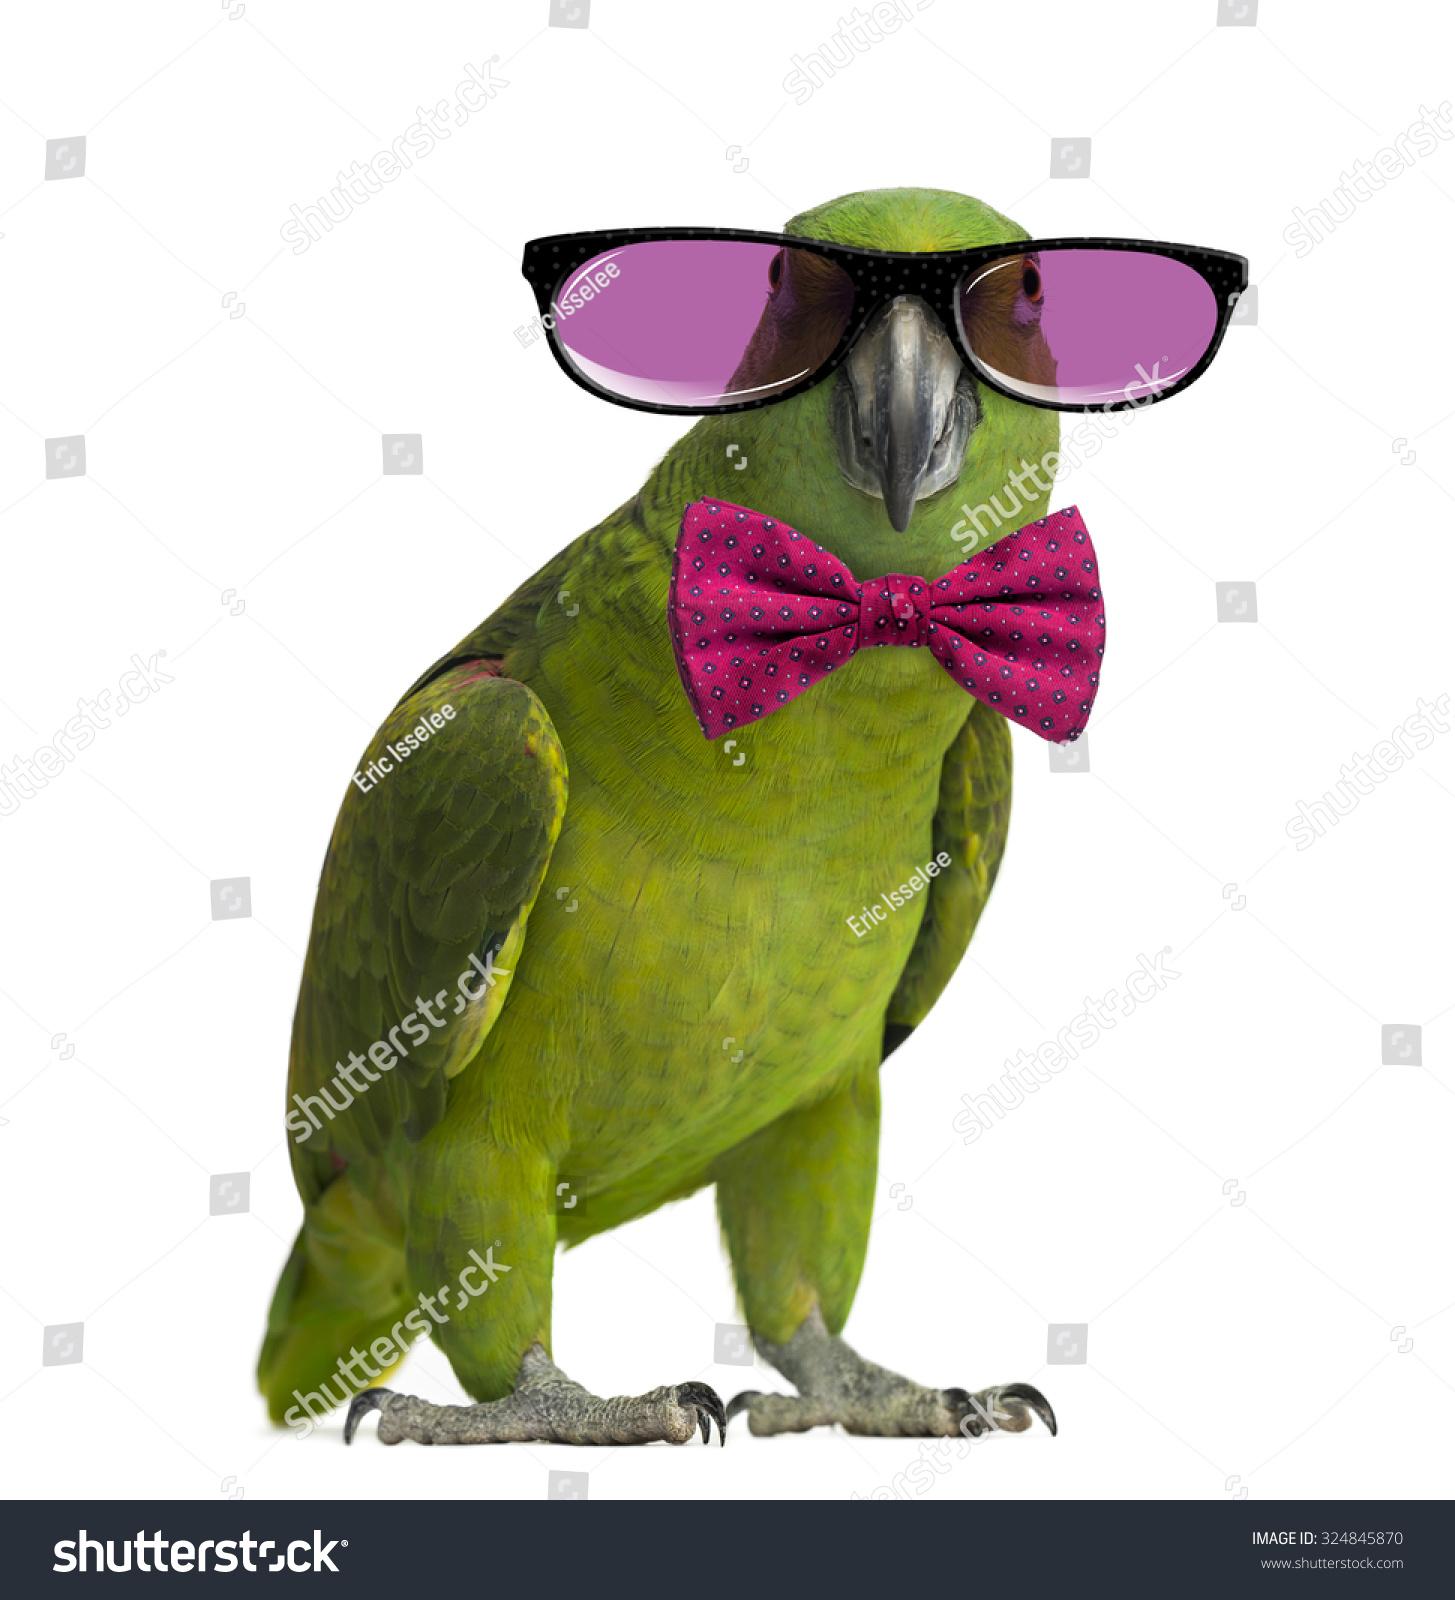 white oakley prescription glasses  glasses and a